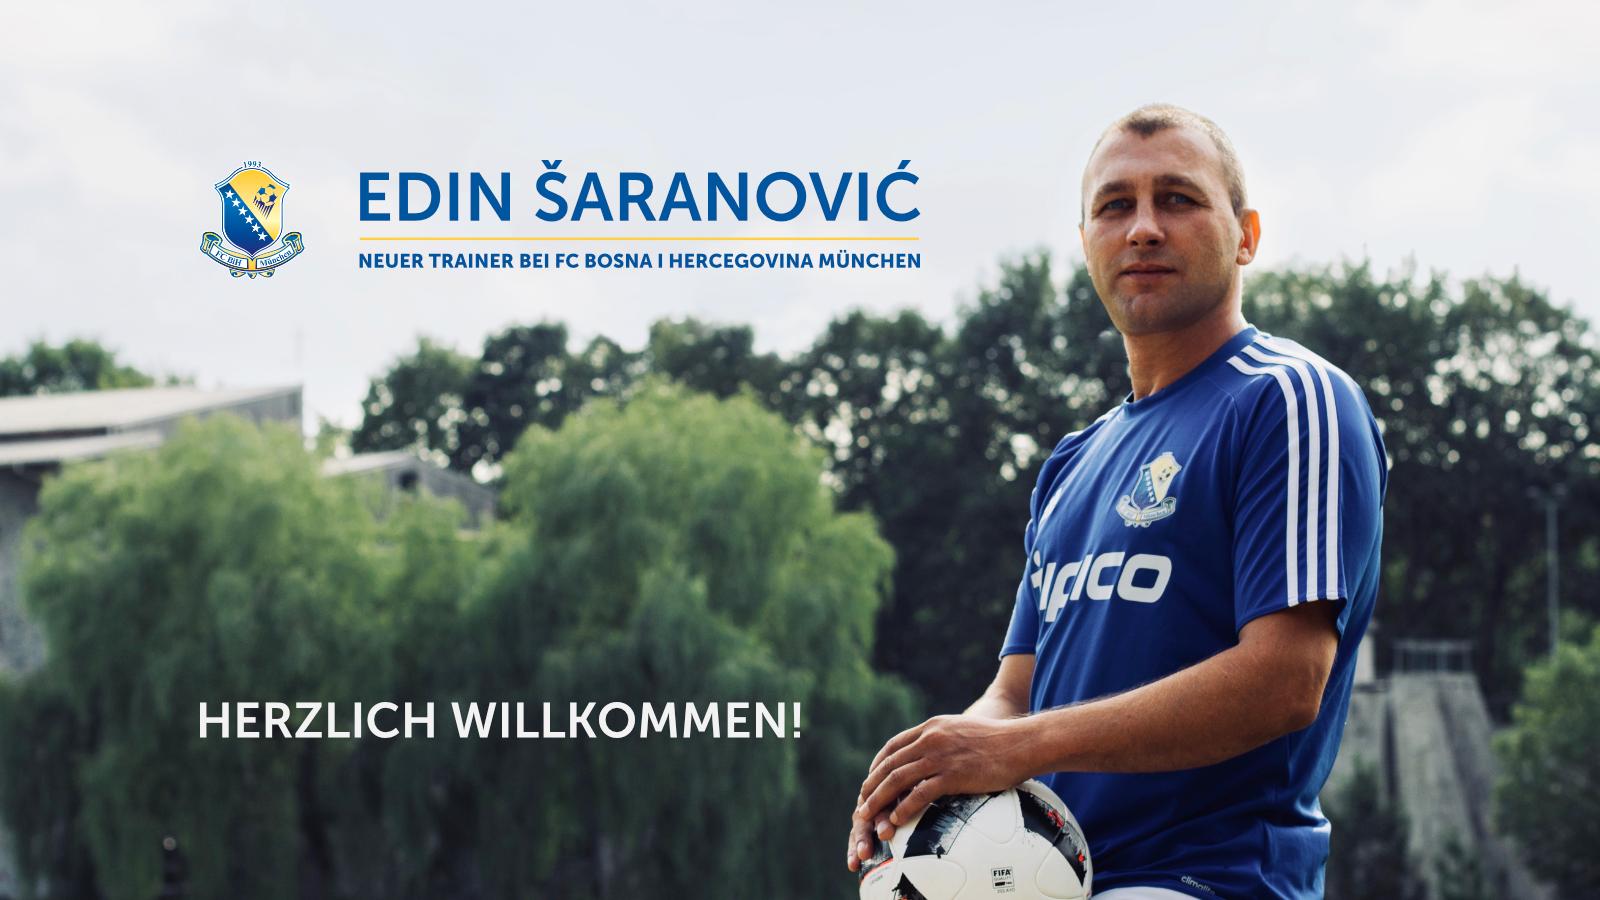 Herzlich Willkommen - Edin Šaranović